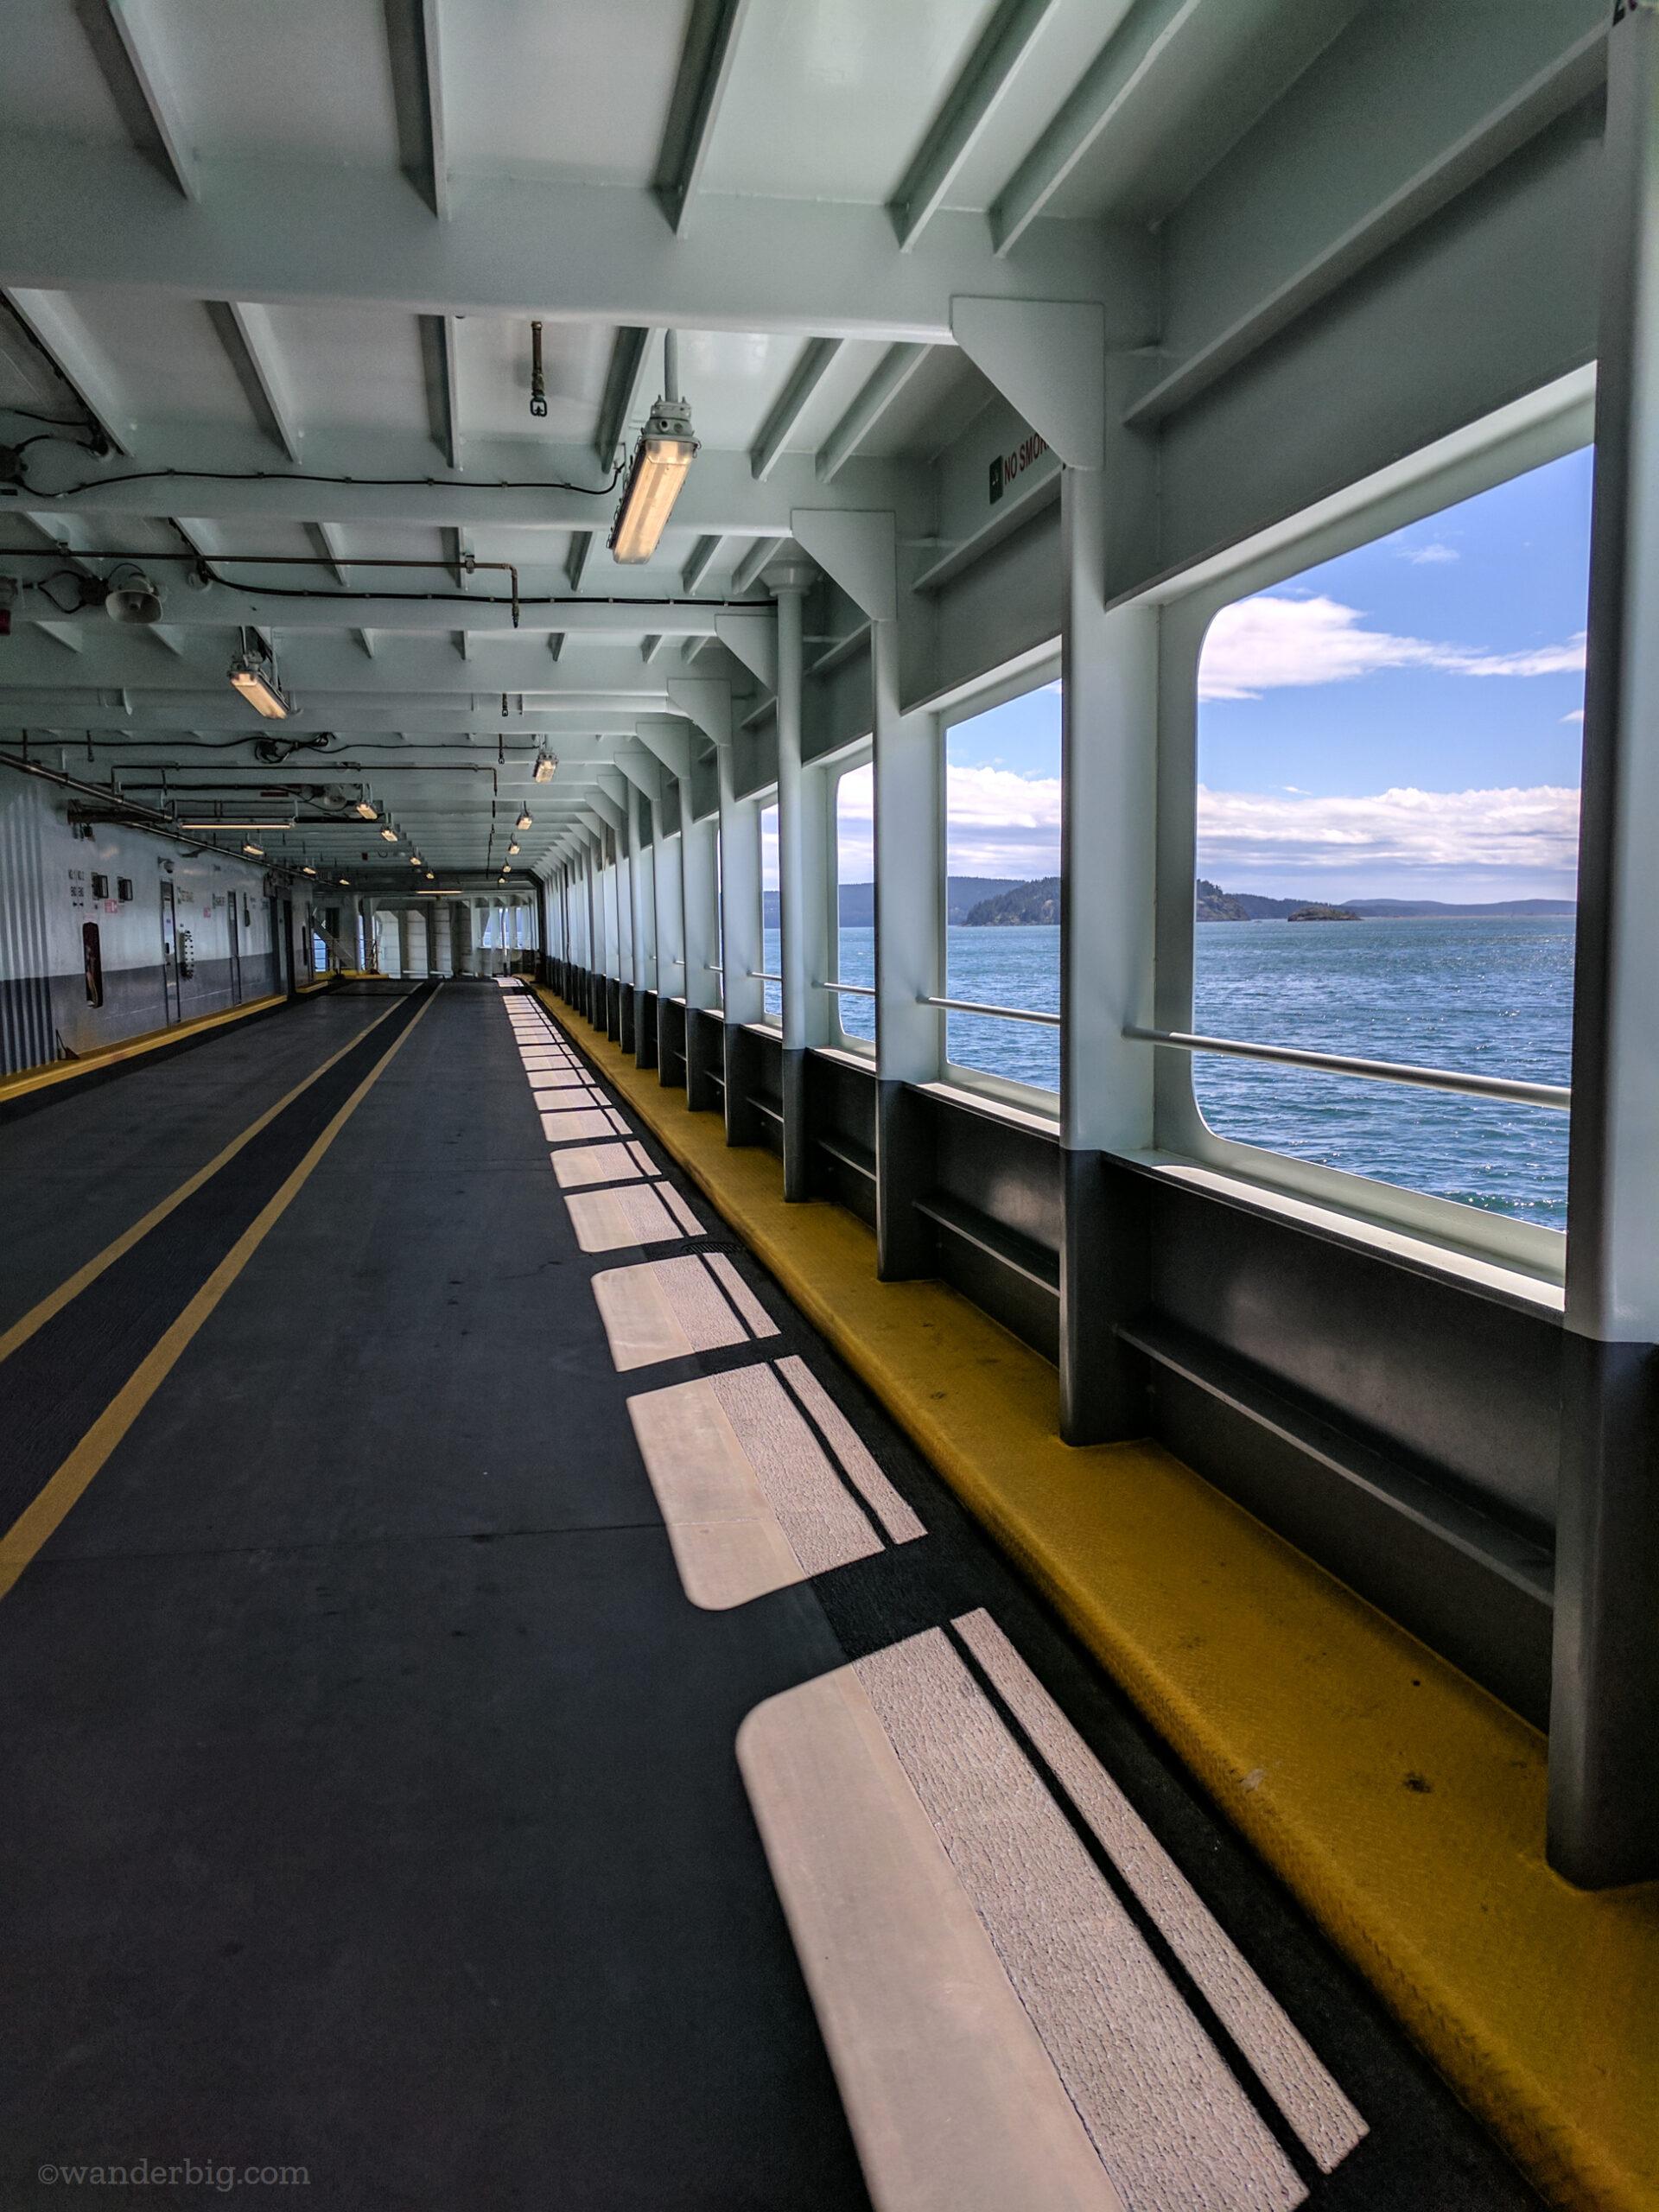 An empty car deck on a ferry in seattle.